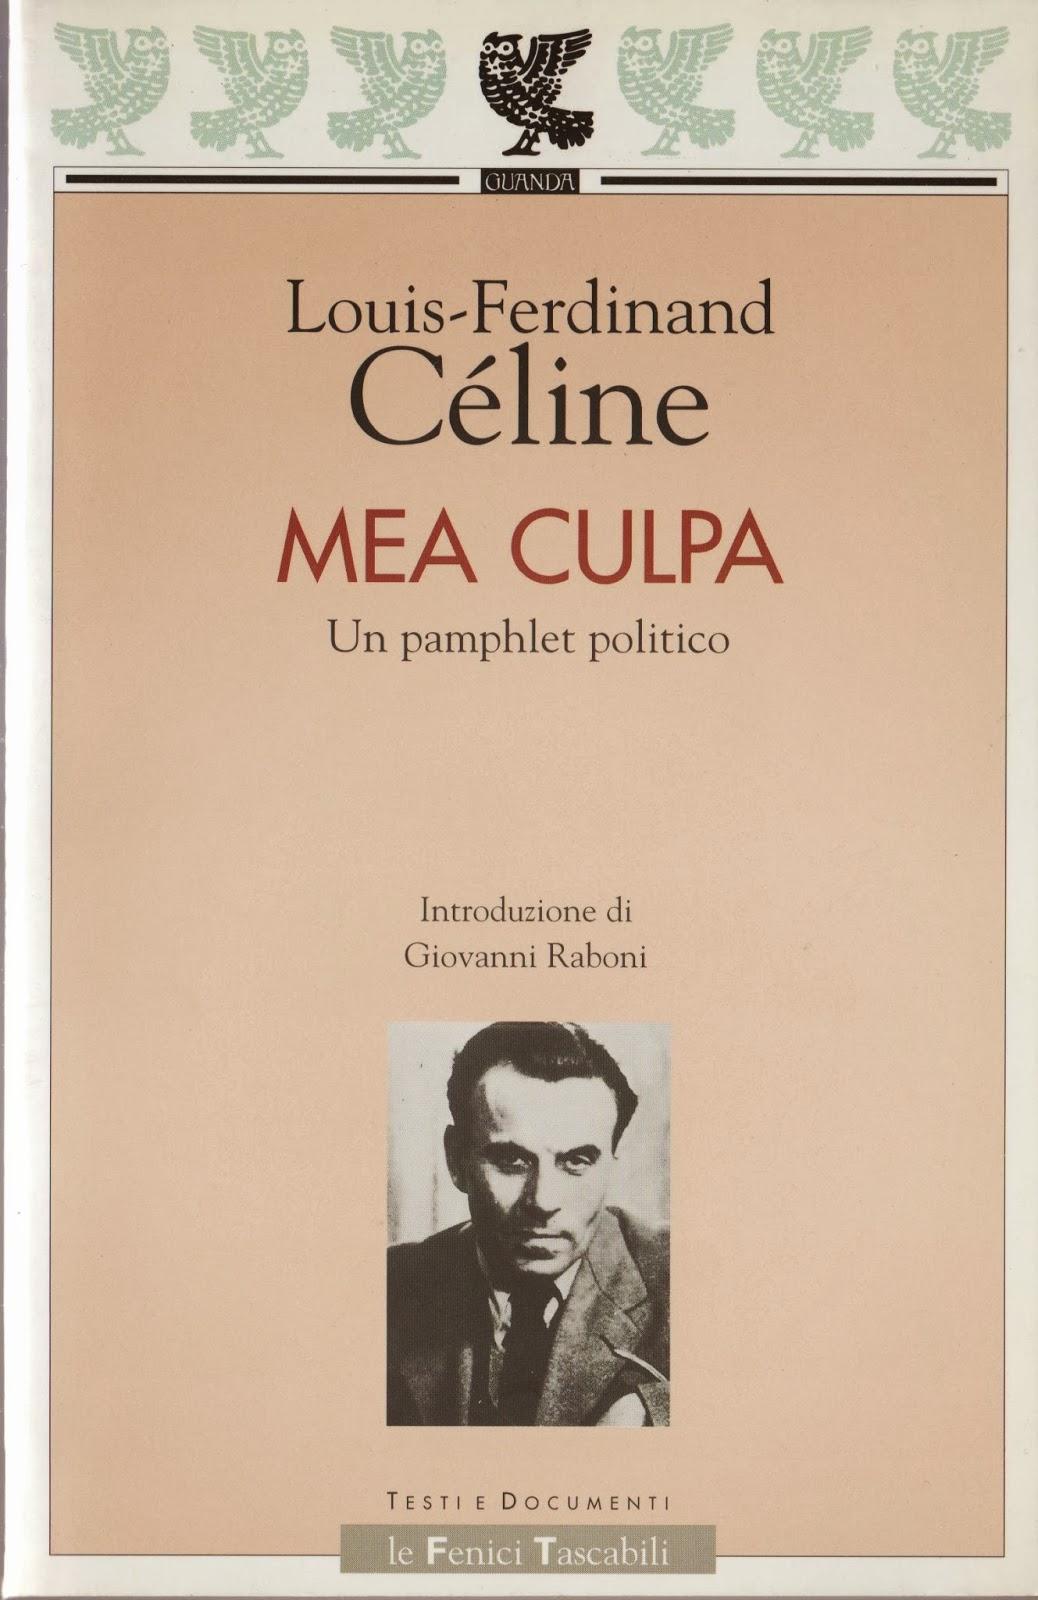 Louis-Ferdinand Céline, Mea culpa, Guanda